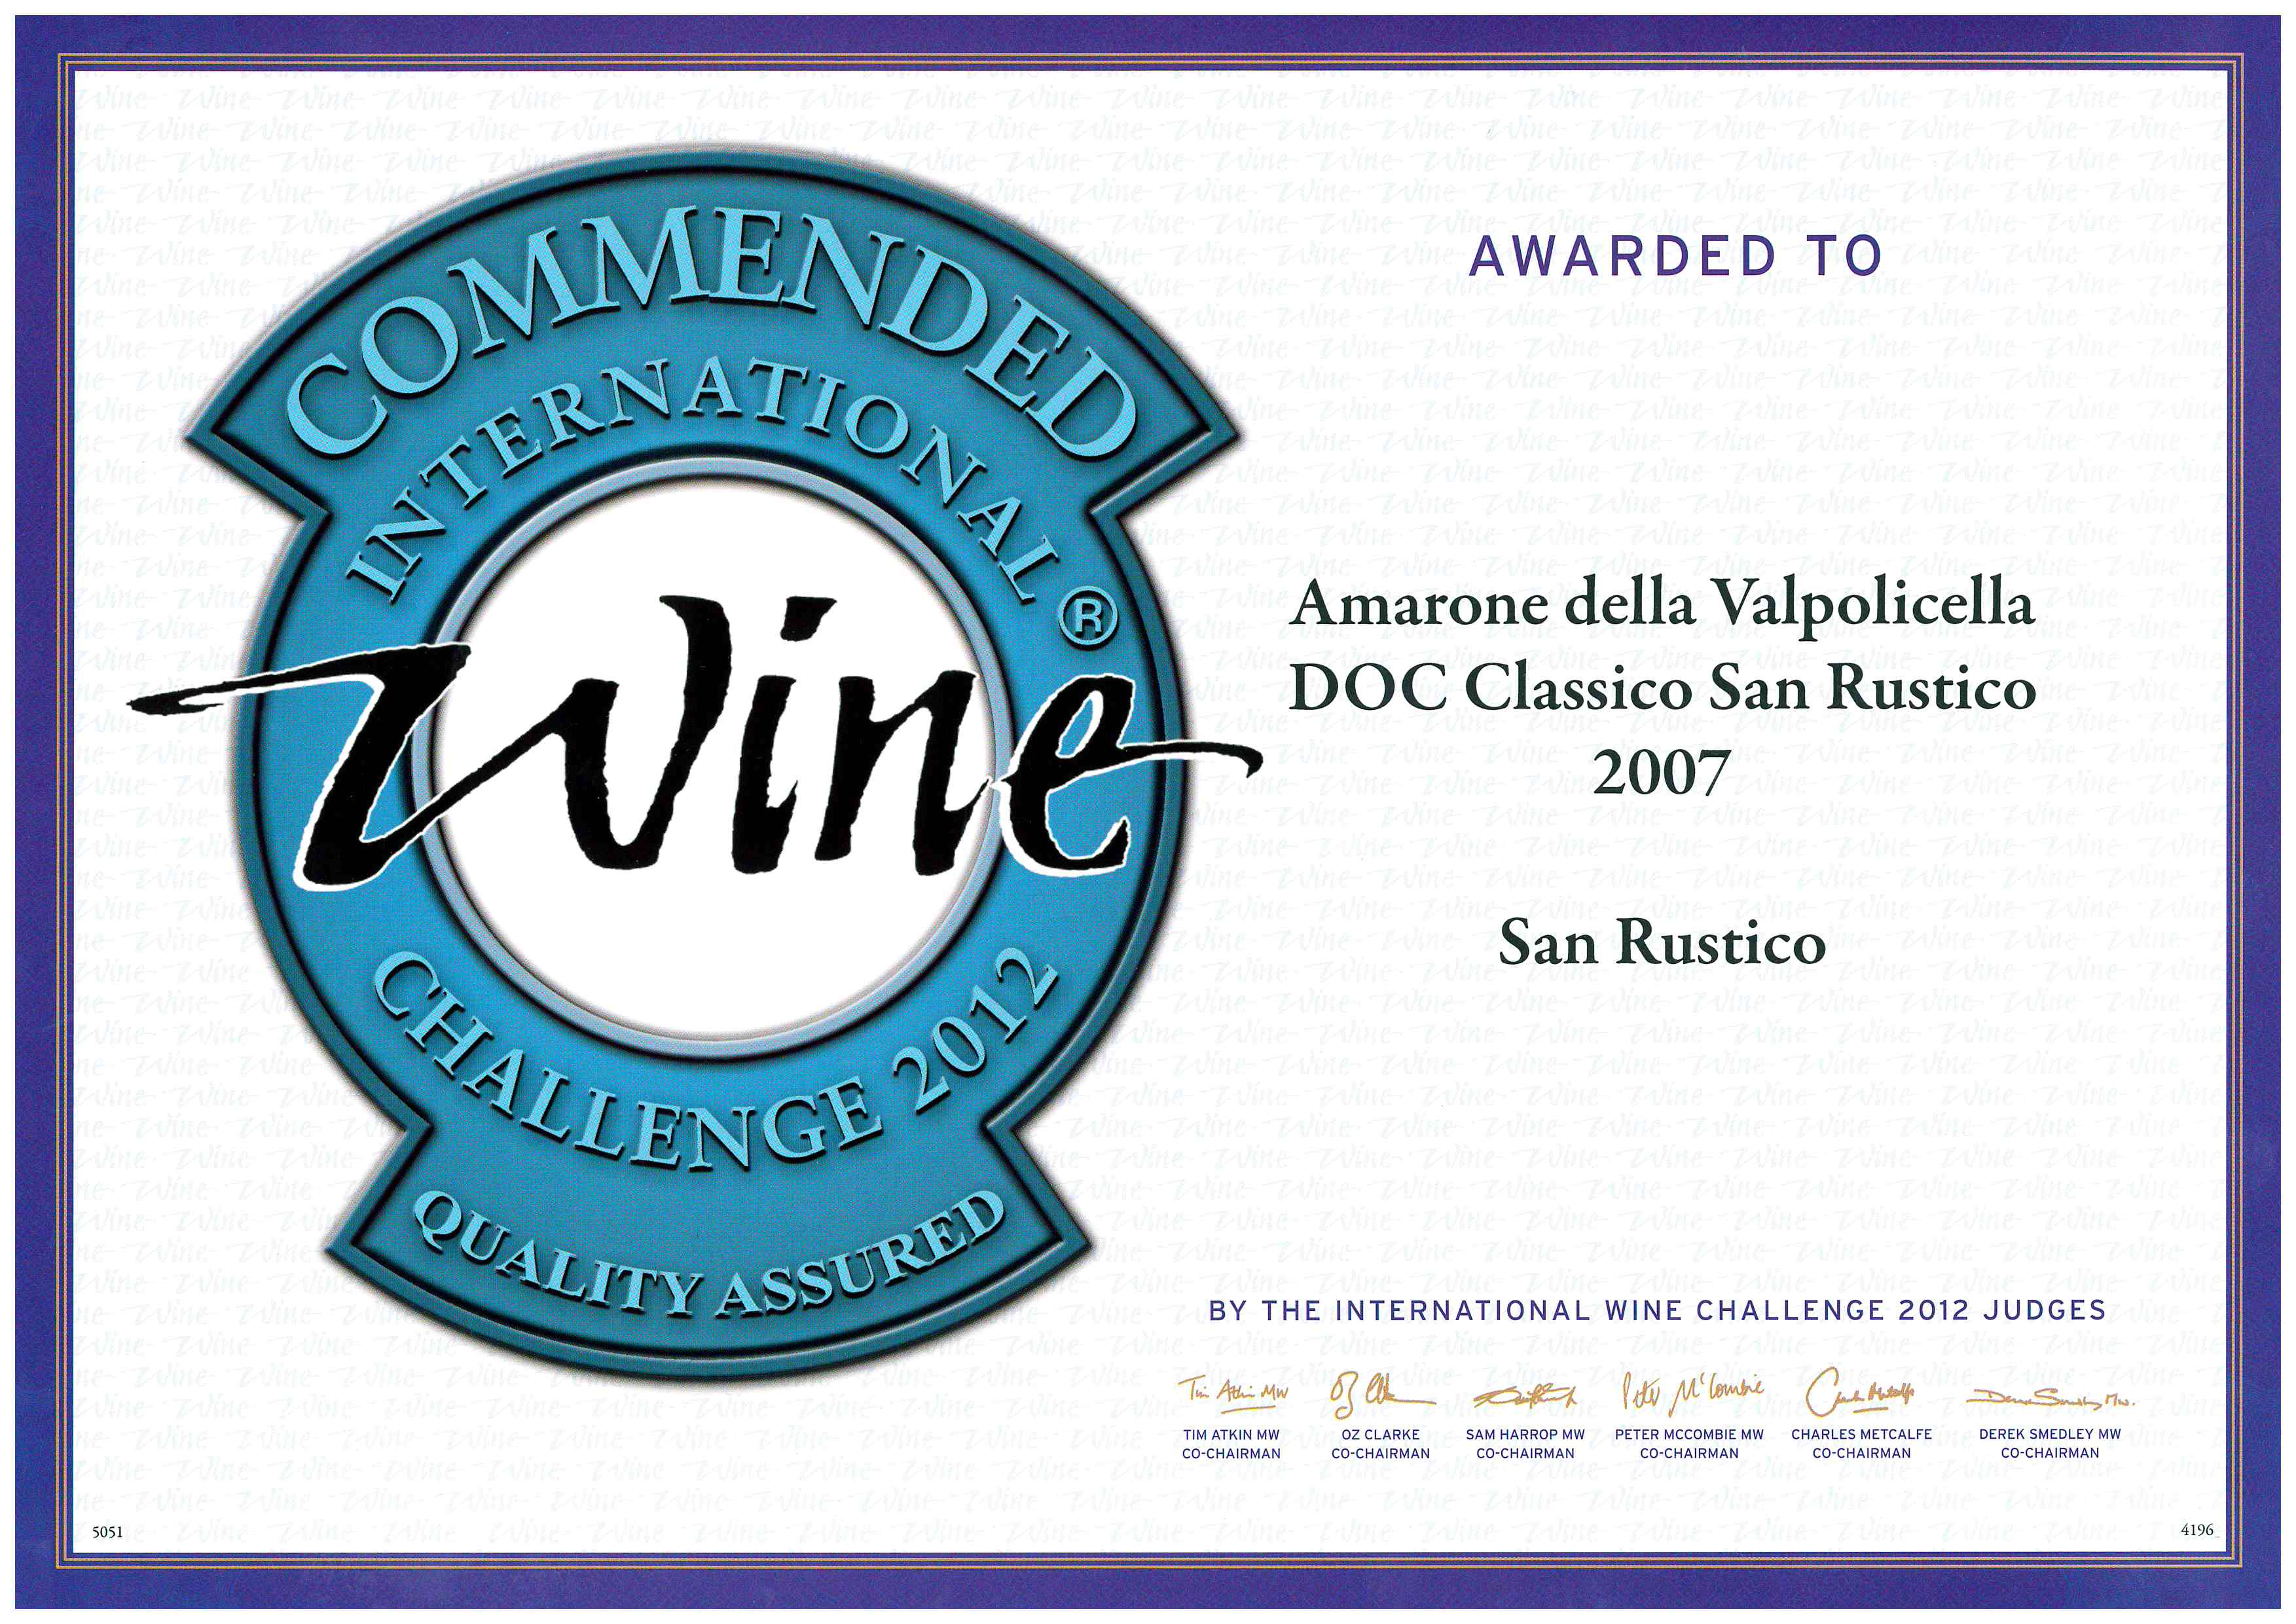 wine challenge 2012 ripasso 2008